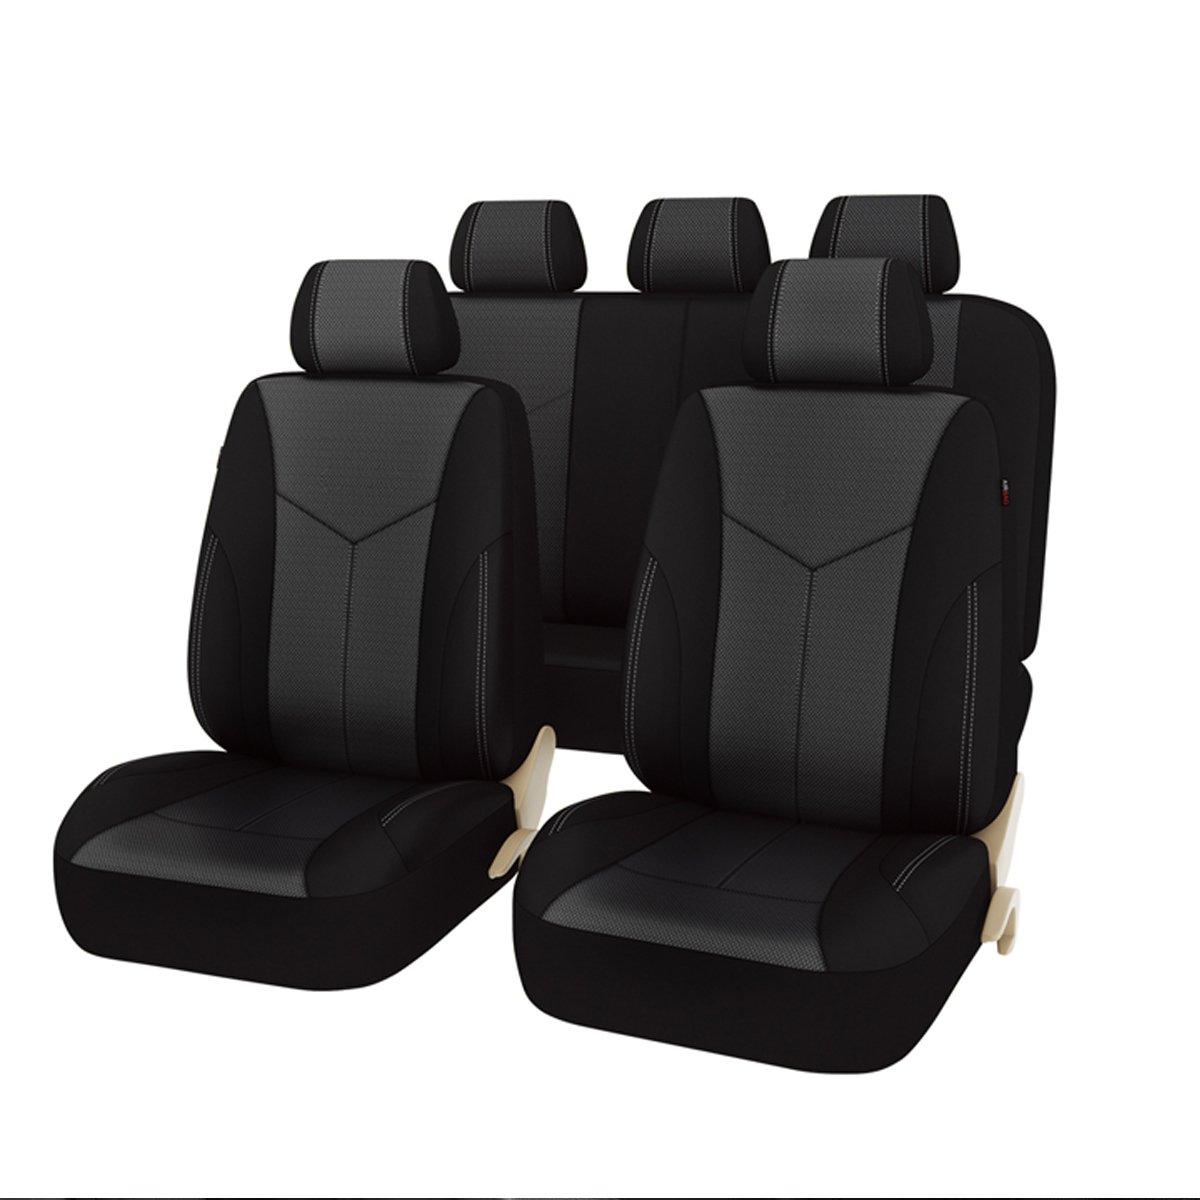 Car Pass汎用シートカバーセット ブラック zt-0011-4 B01M2UMJBL  ブラック